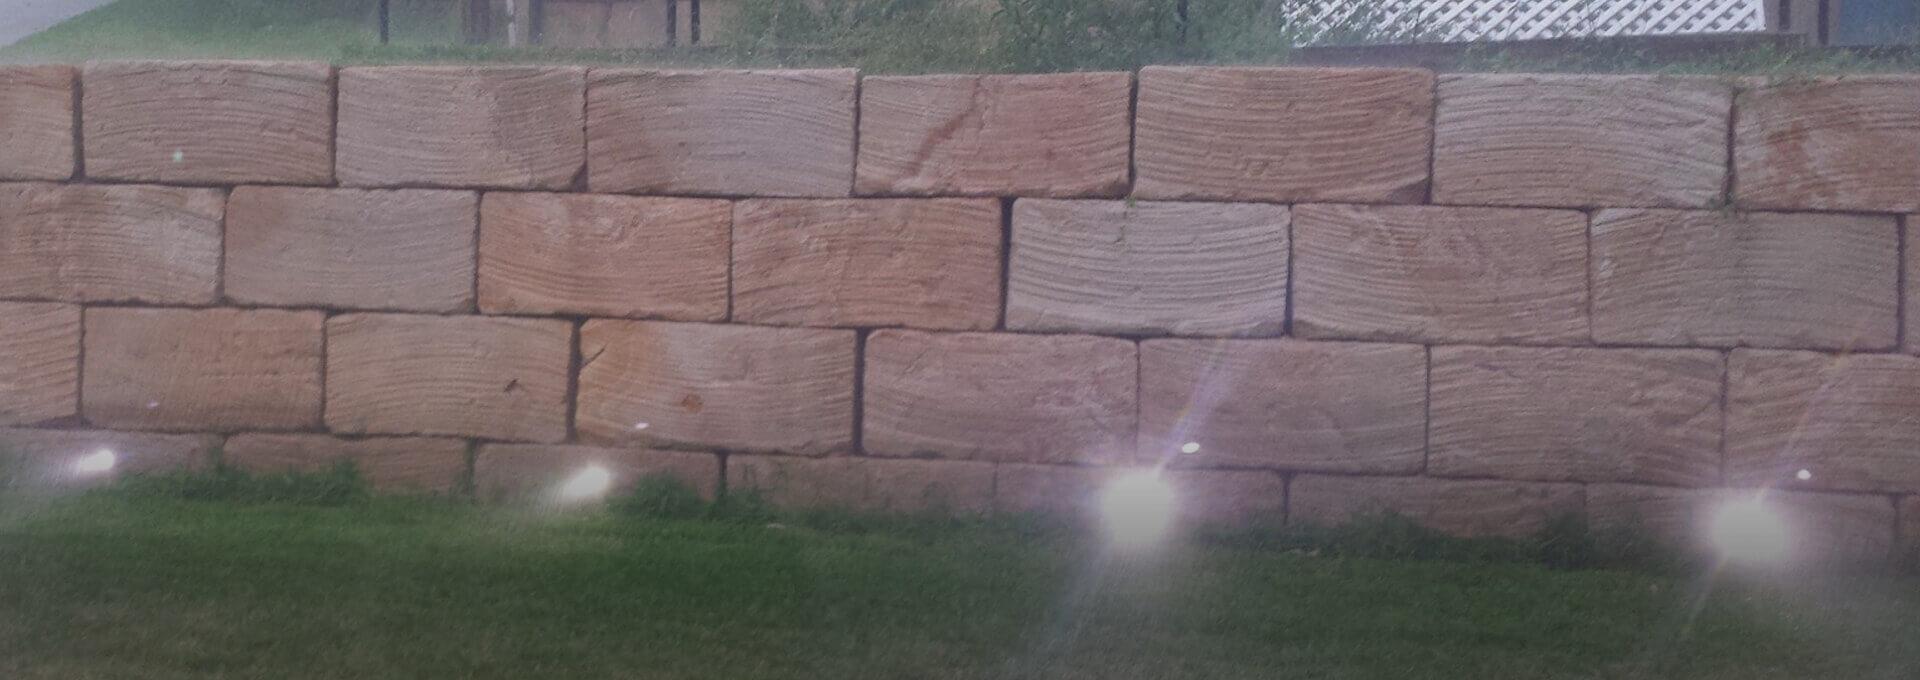 Sandstone Masonry Walls and Architecture Brisbane Rock Sales